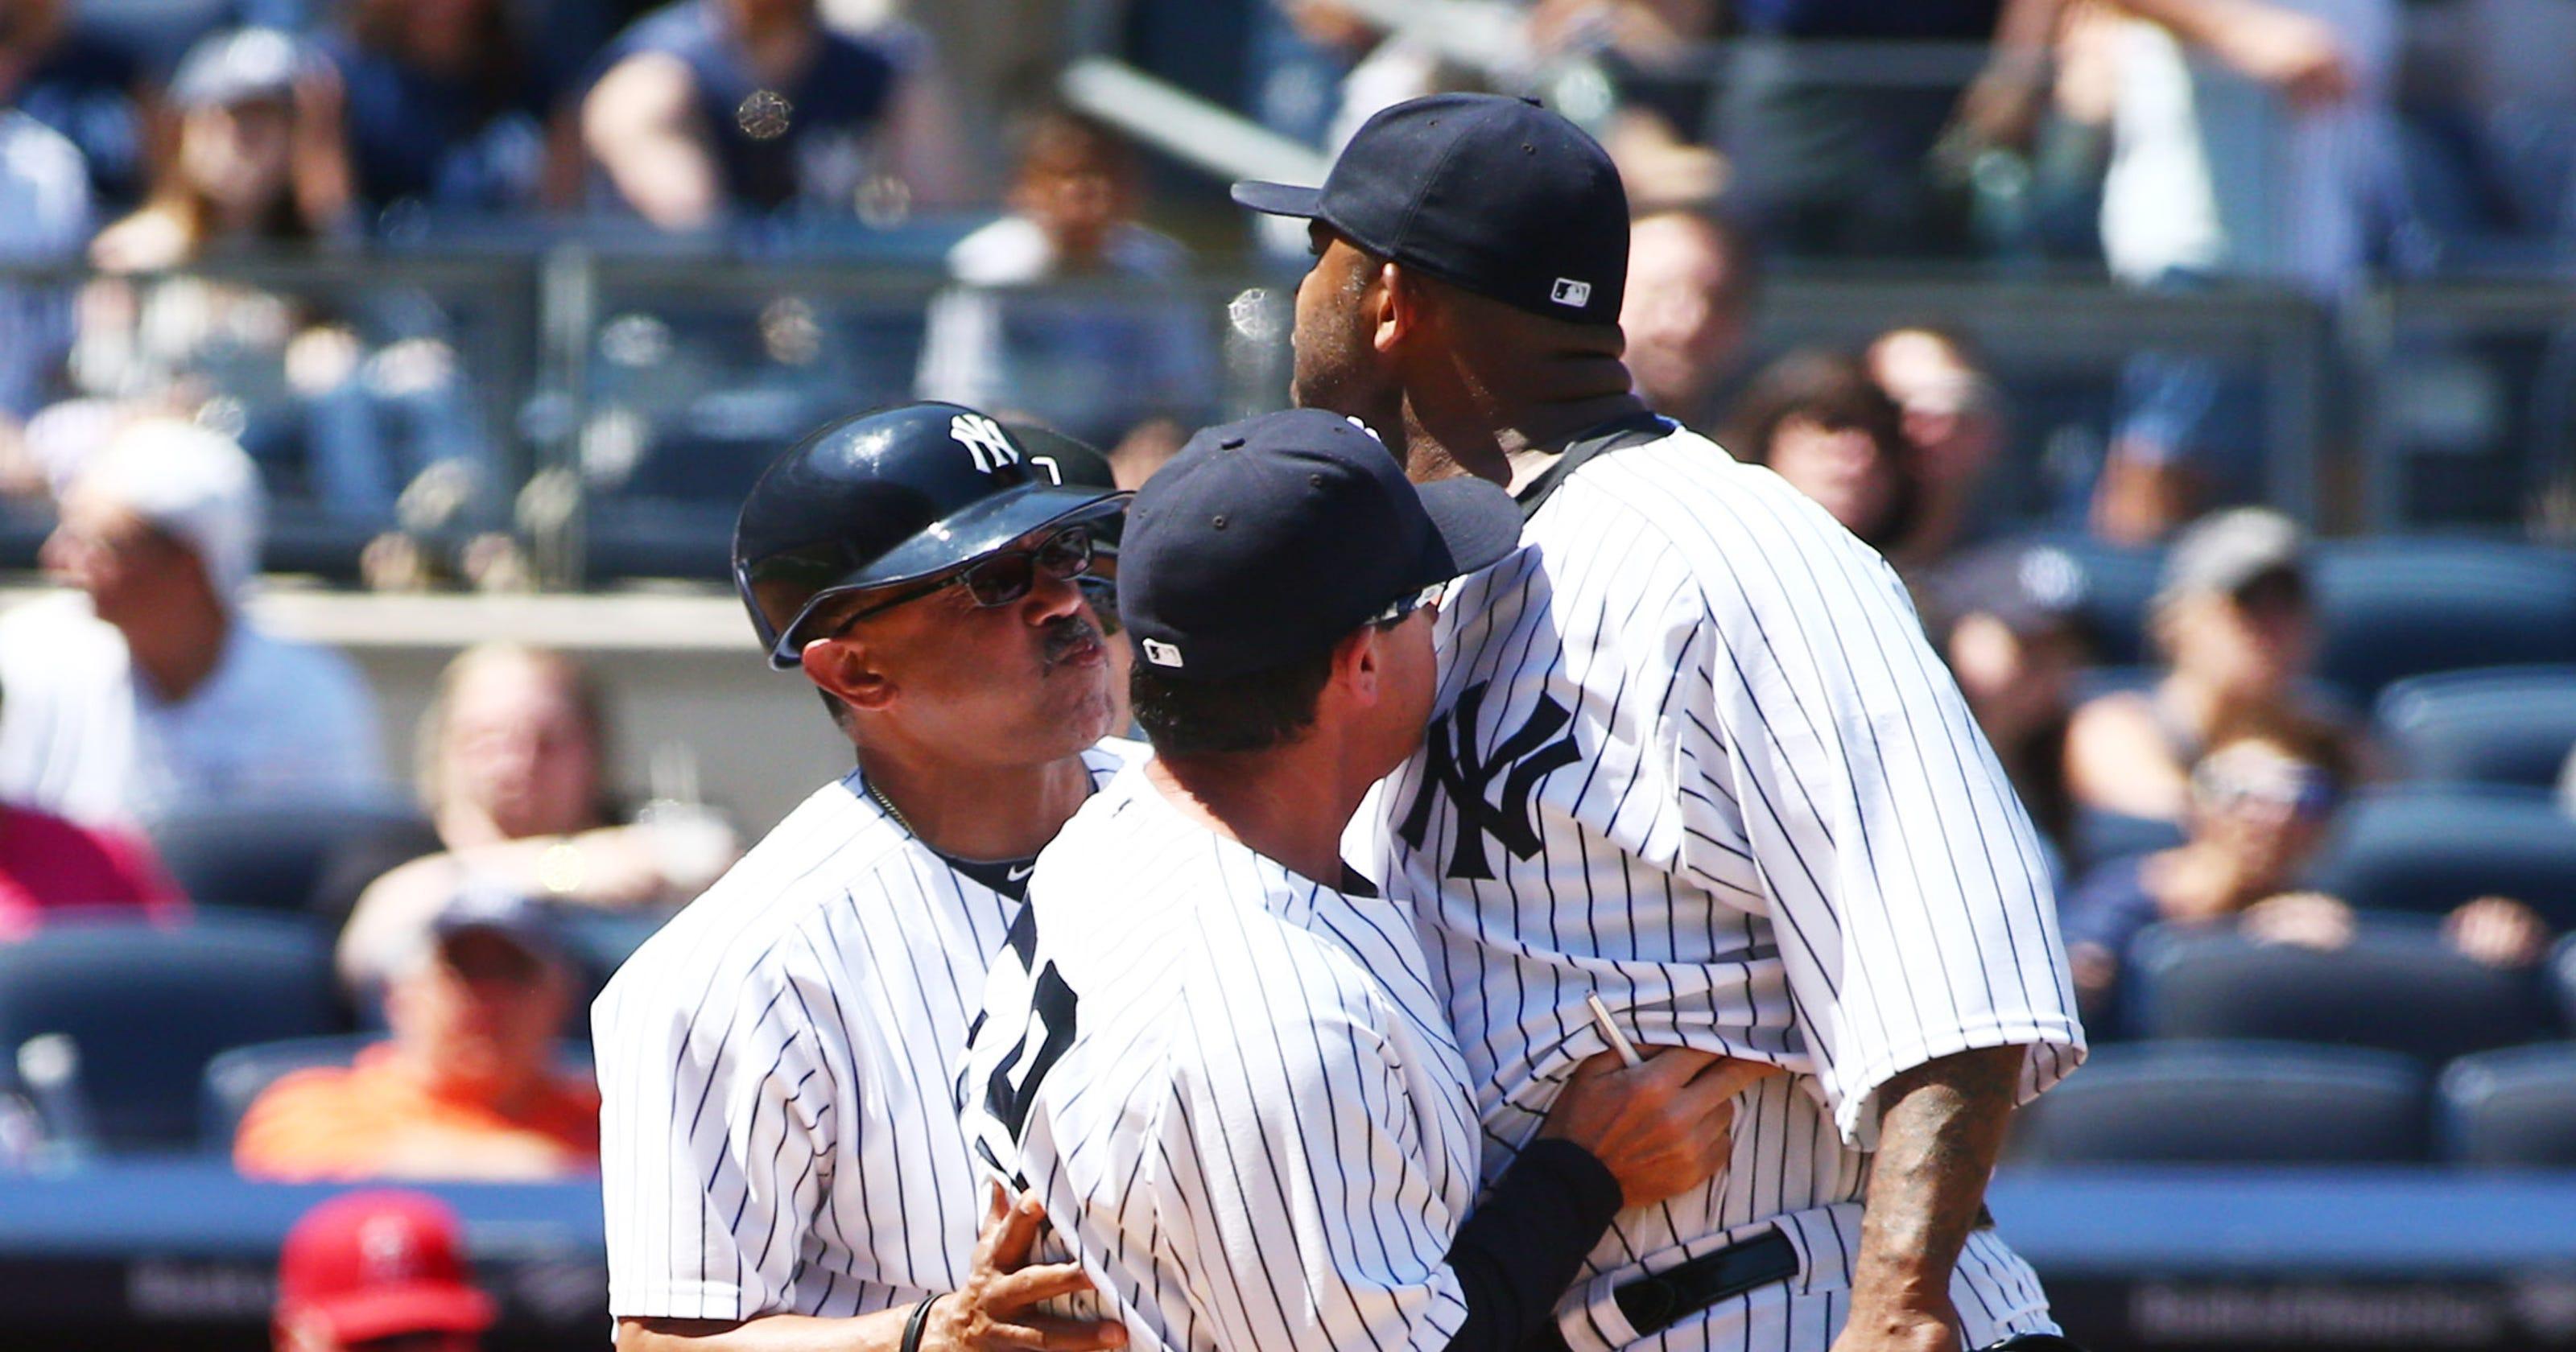 736a0bd5f33aa Yankees sweep Angels as CC Sabathia settles in